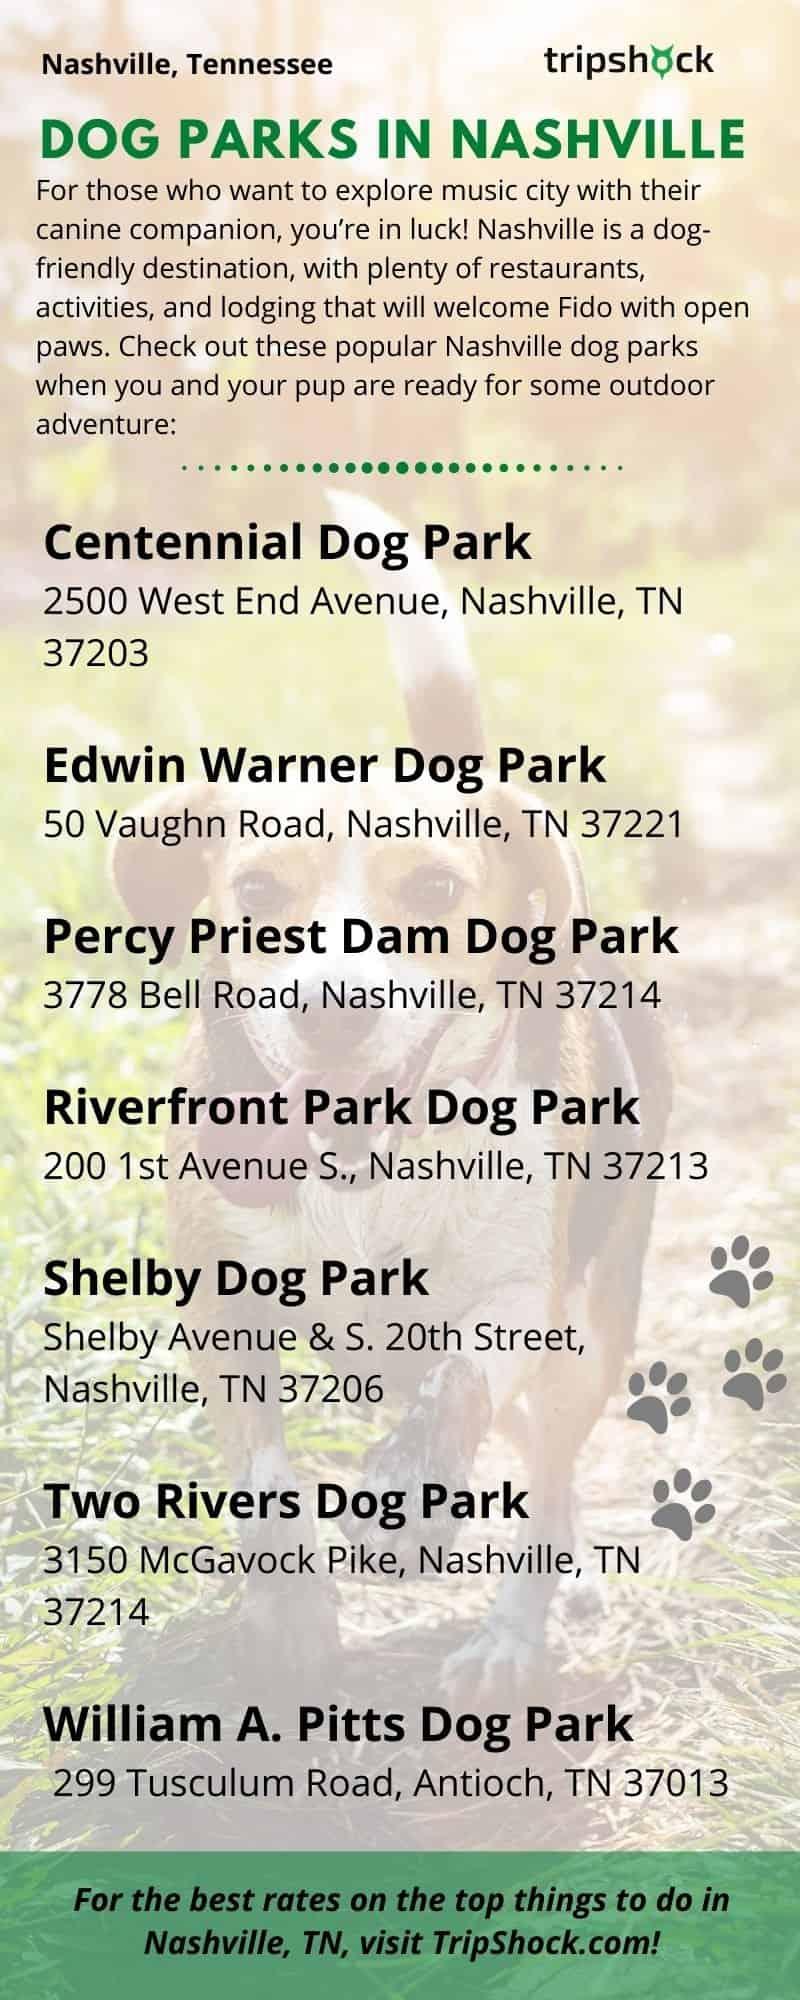 Dog Parks in Nashville, TN